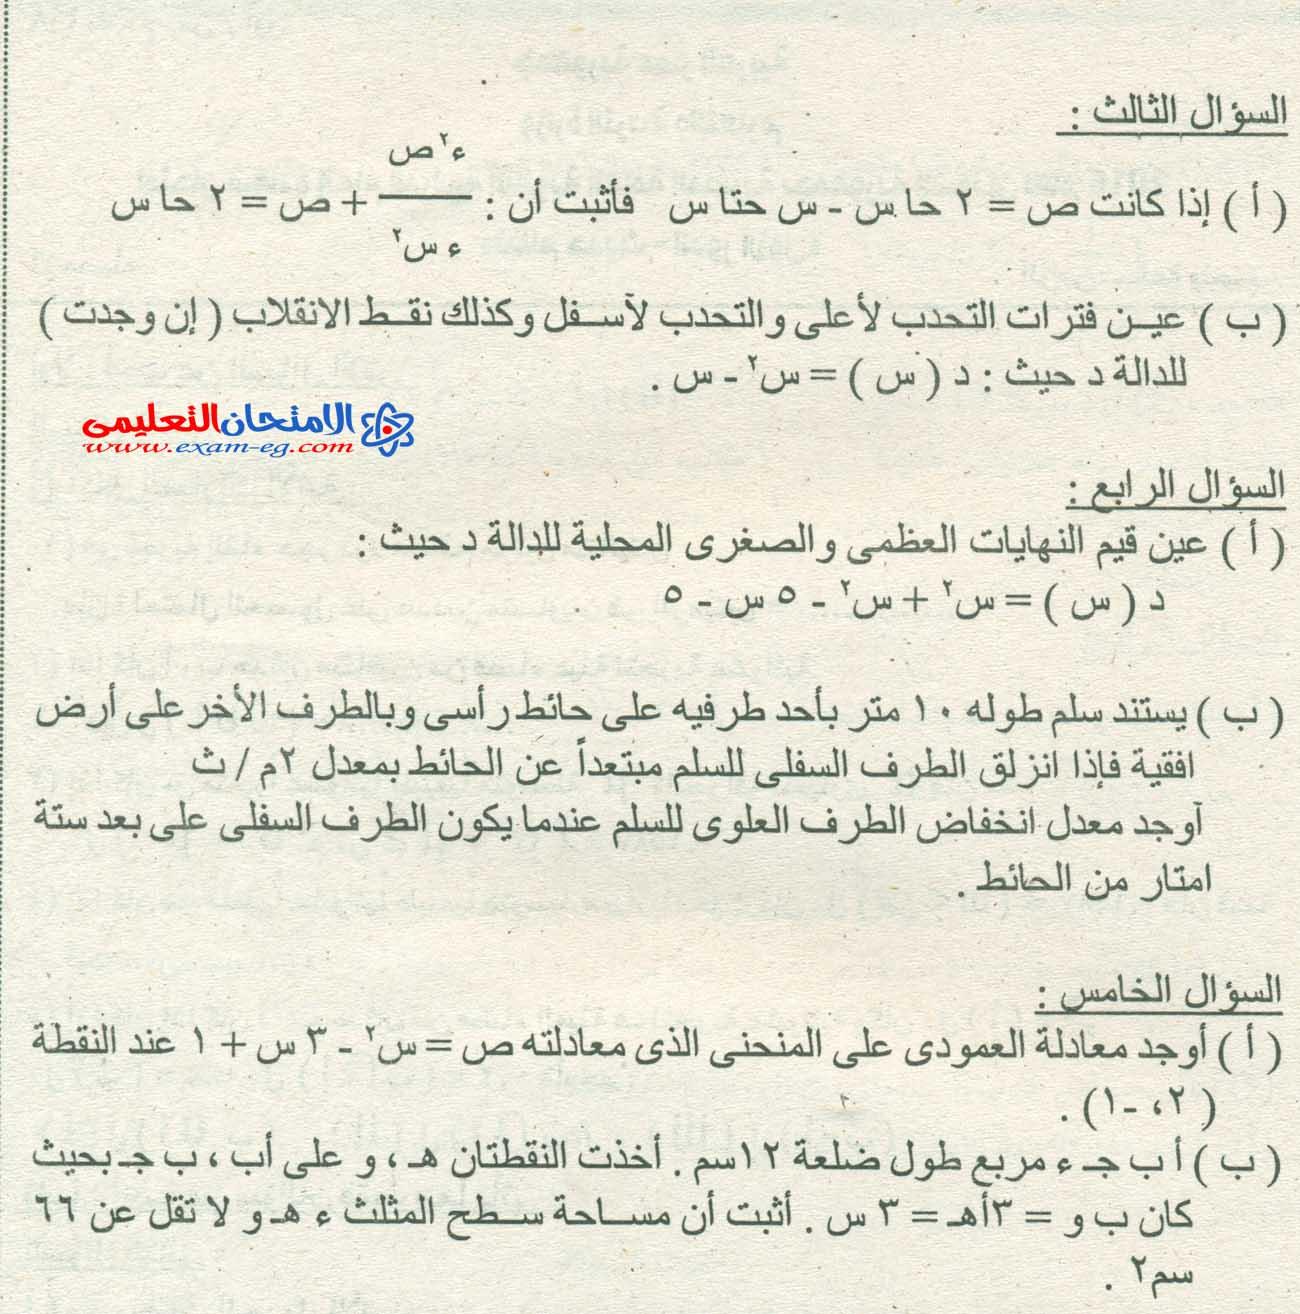 exam-eg.com_1461100089512.jpg